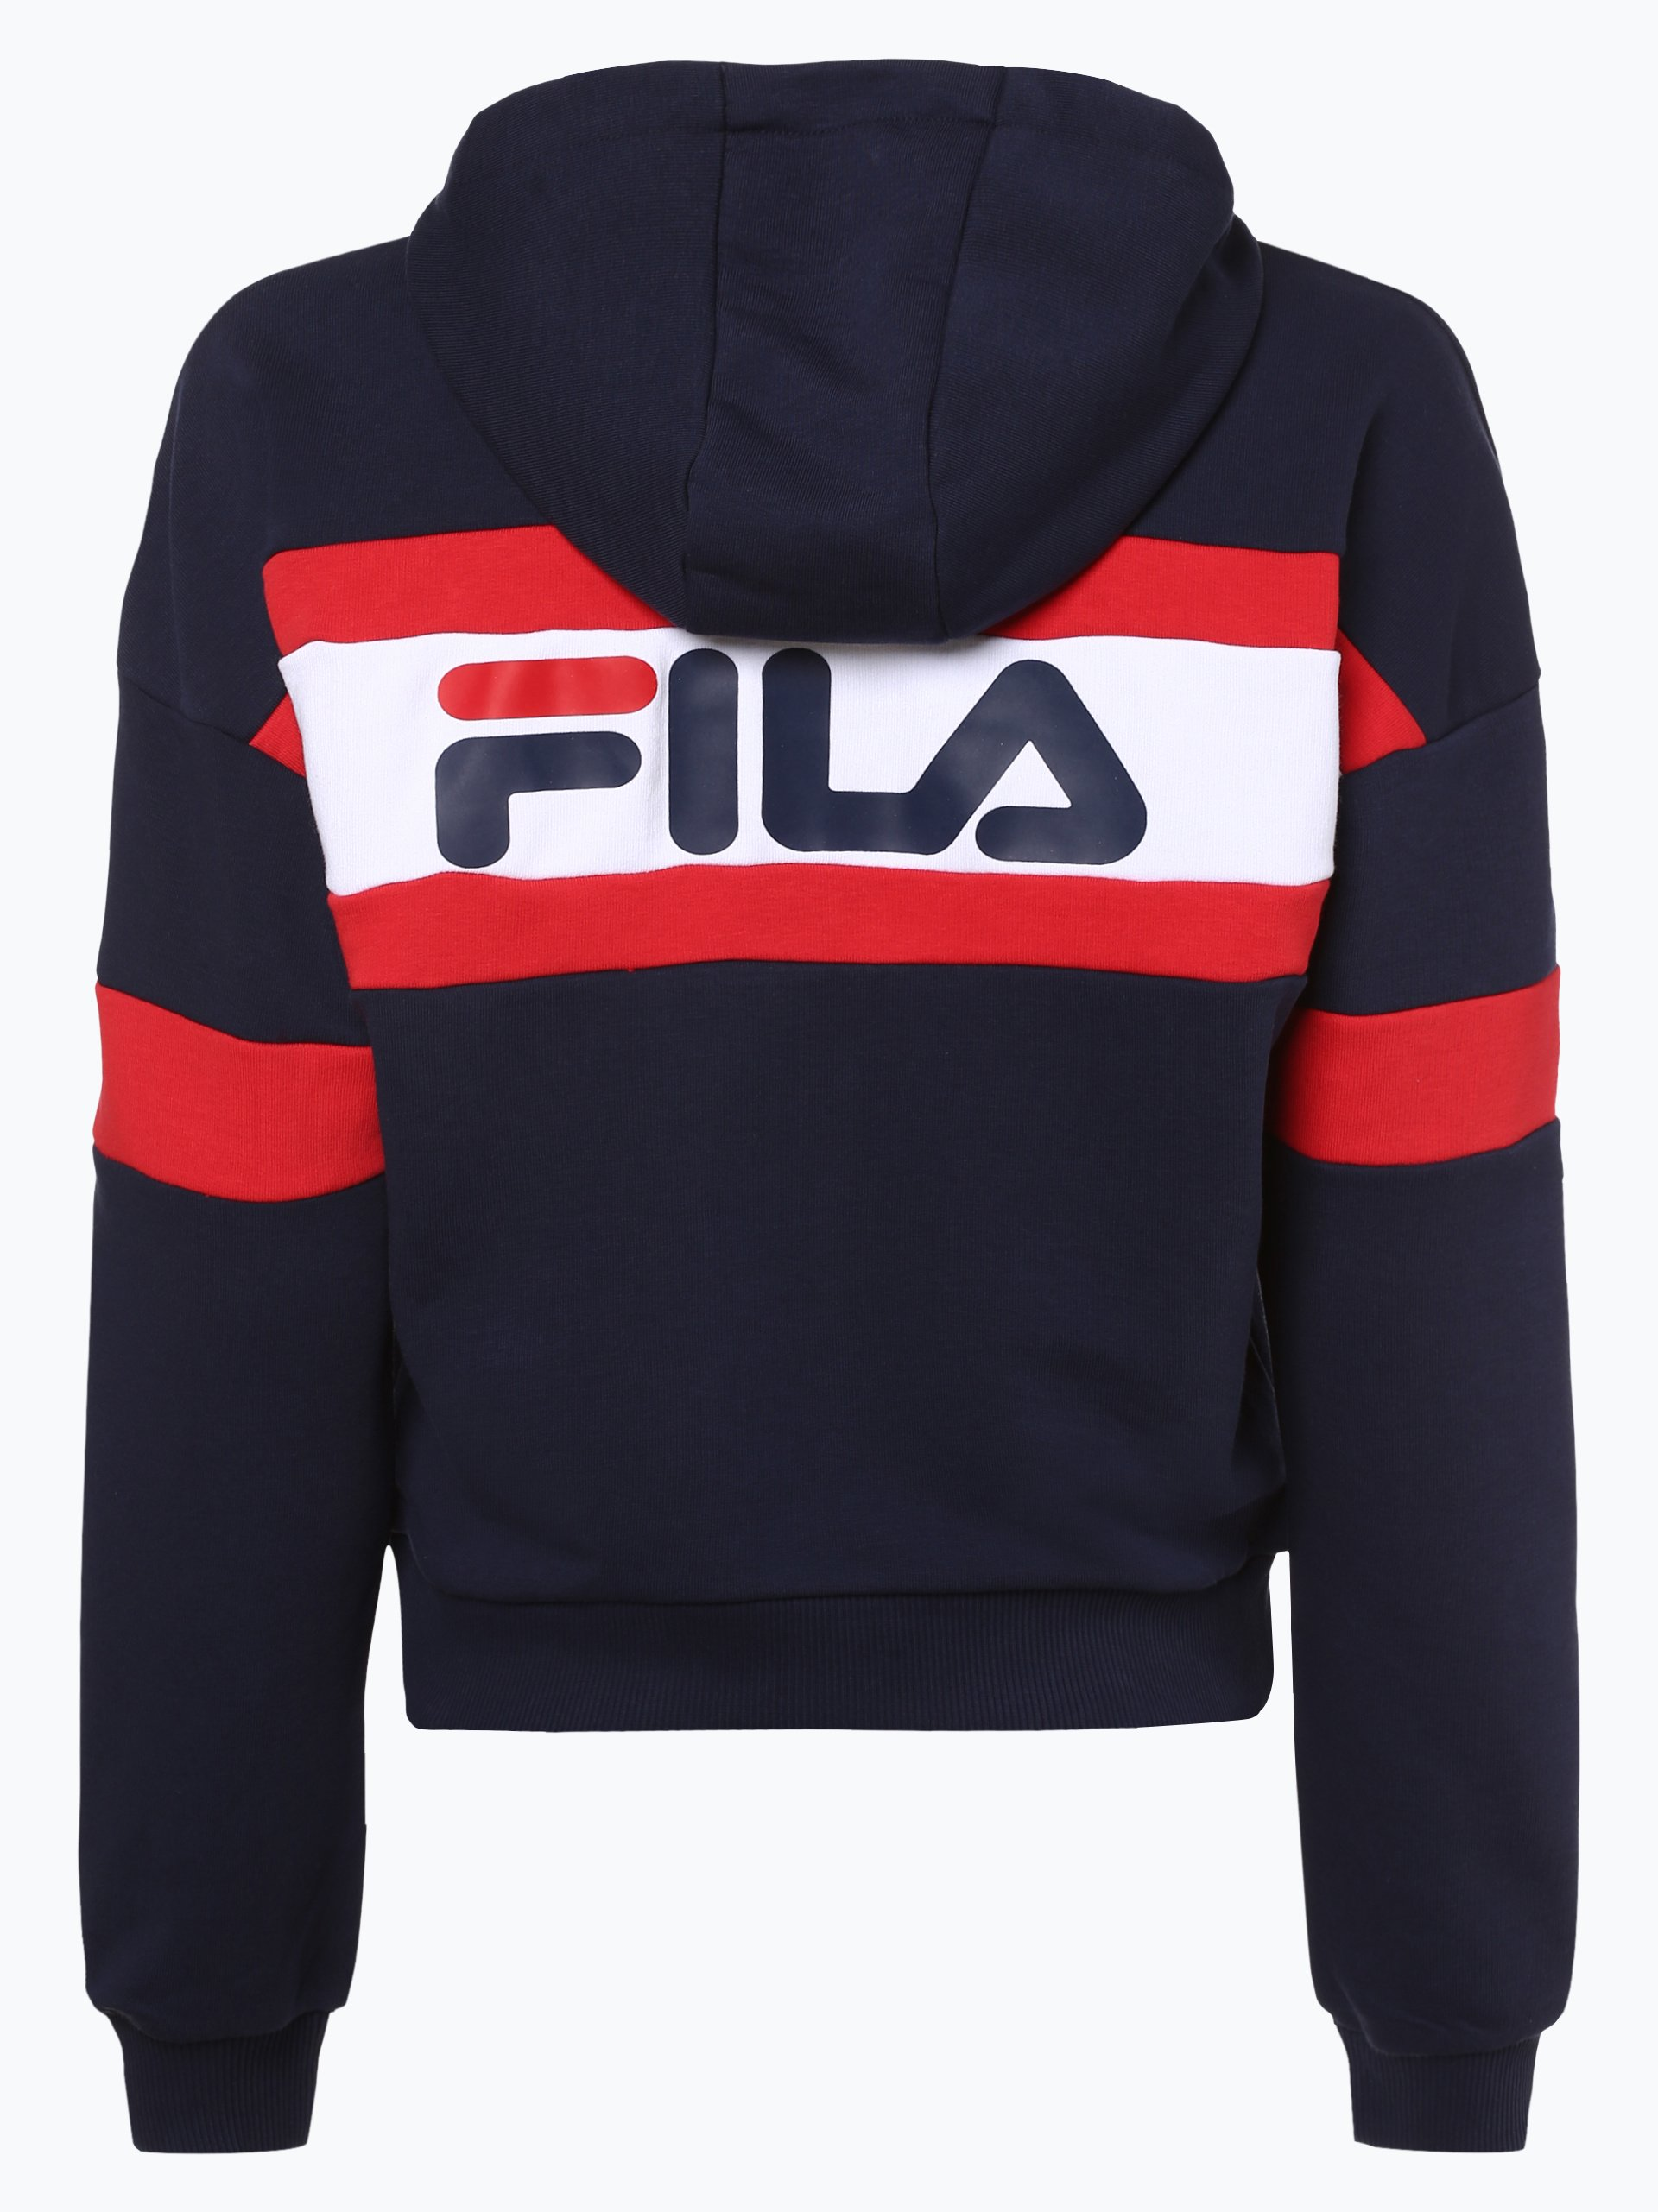 FILA Damen Sweatshirt